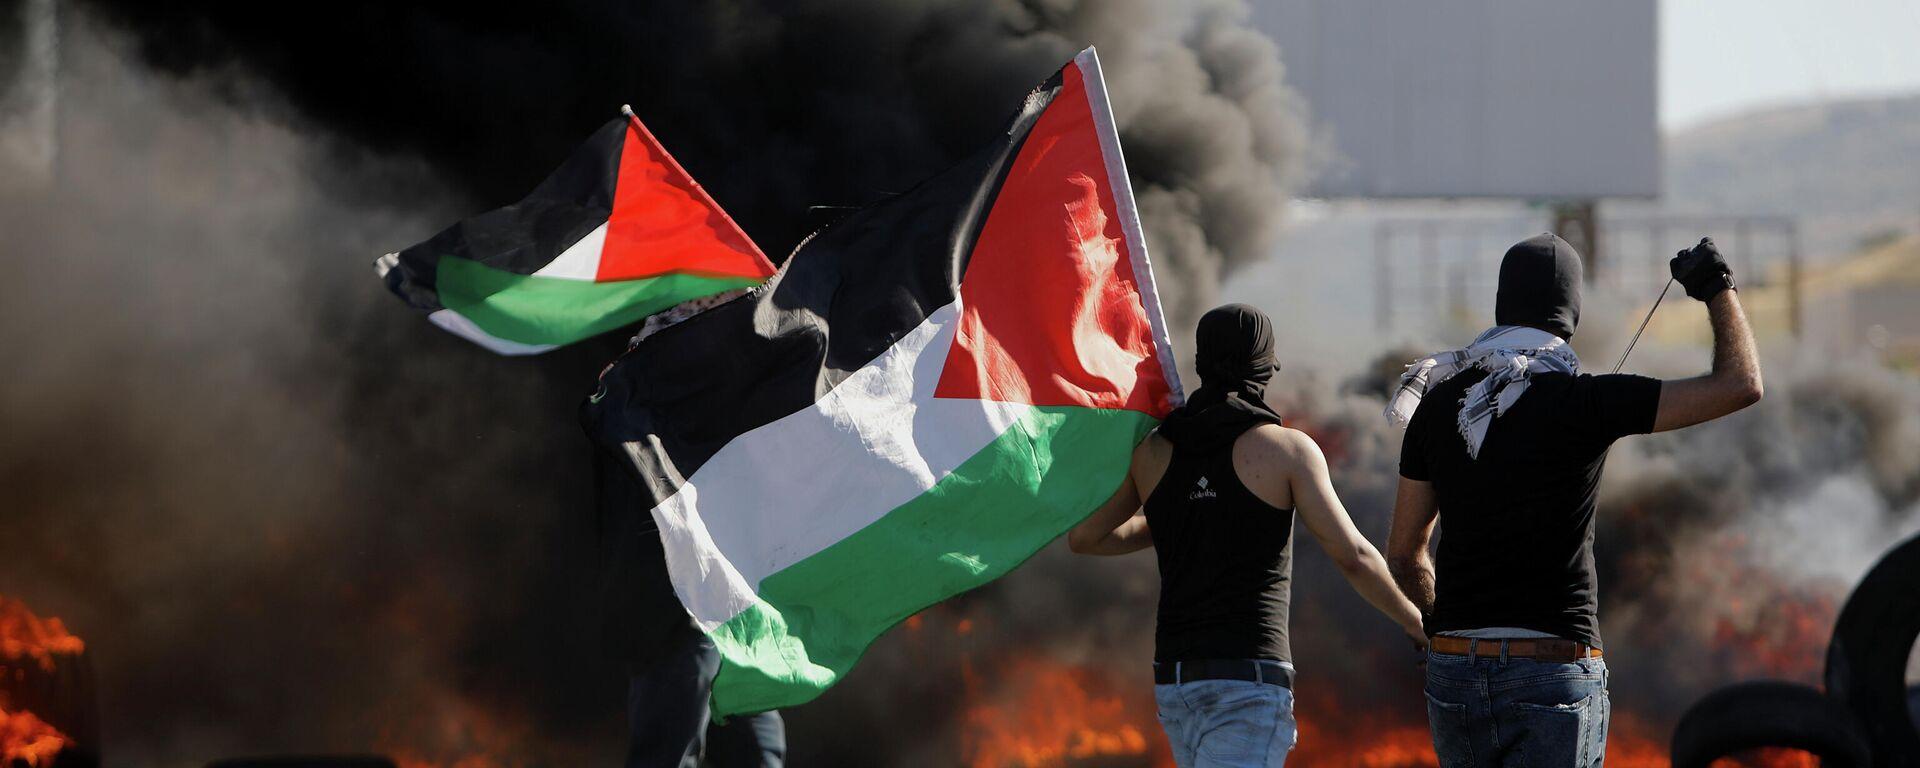 Protestas de Palestina - Sputnik Mundo, 1920, 19.05.2021